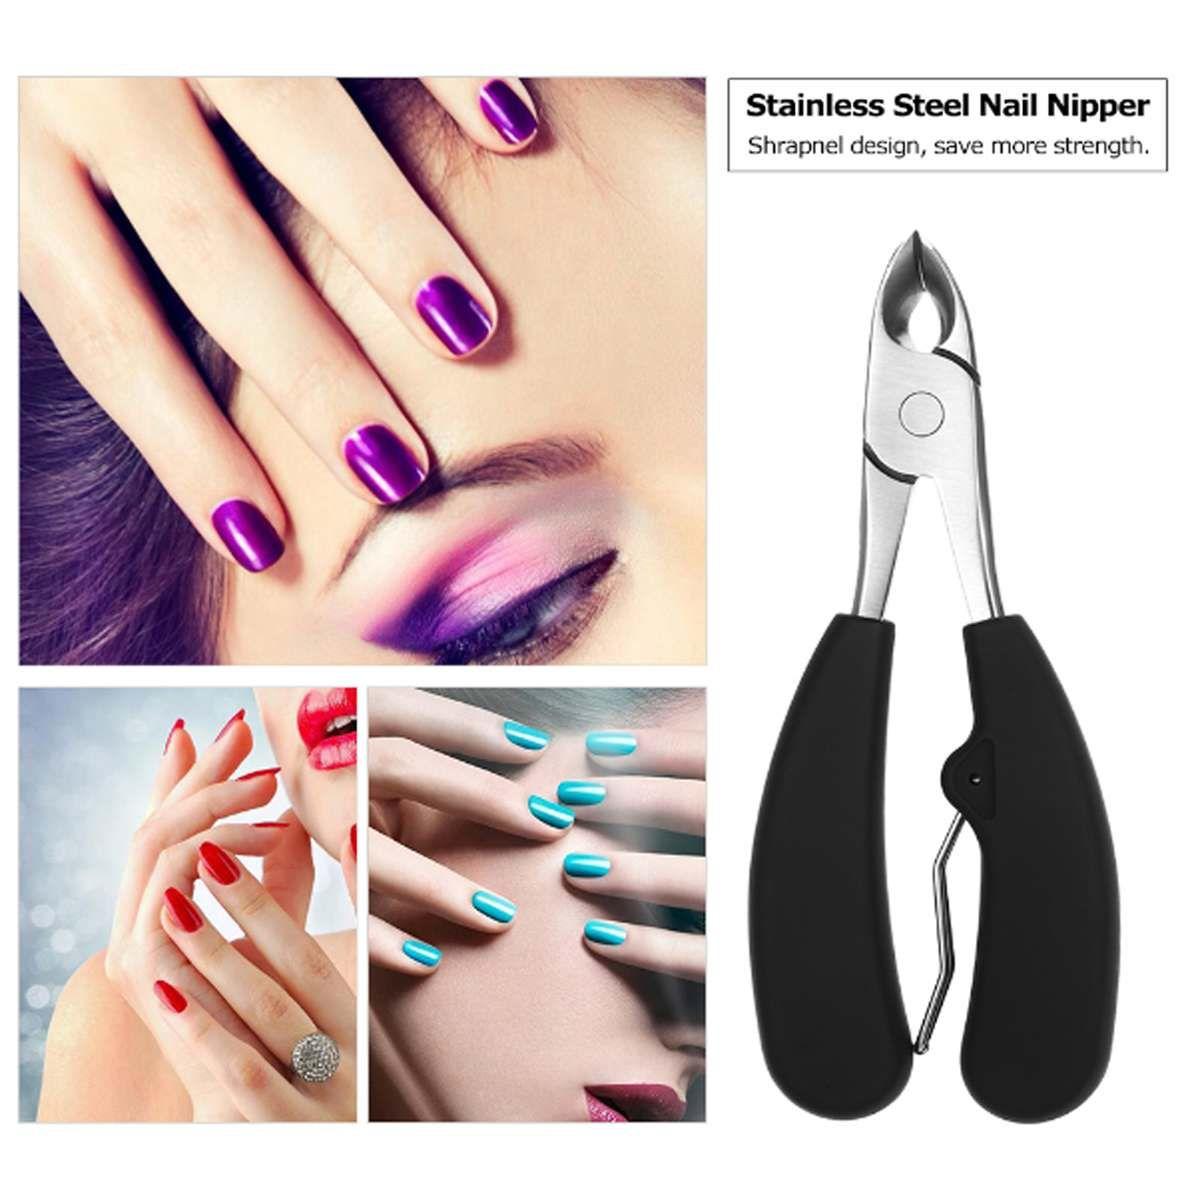 Nail Clipper 11Stainless Steel Toe Trimmer 두꺼운 곰팡이를 넣은 발톱 손톱 가위의 라디안을위한 가위 디자인